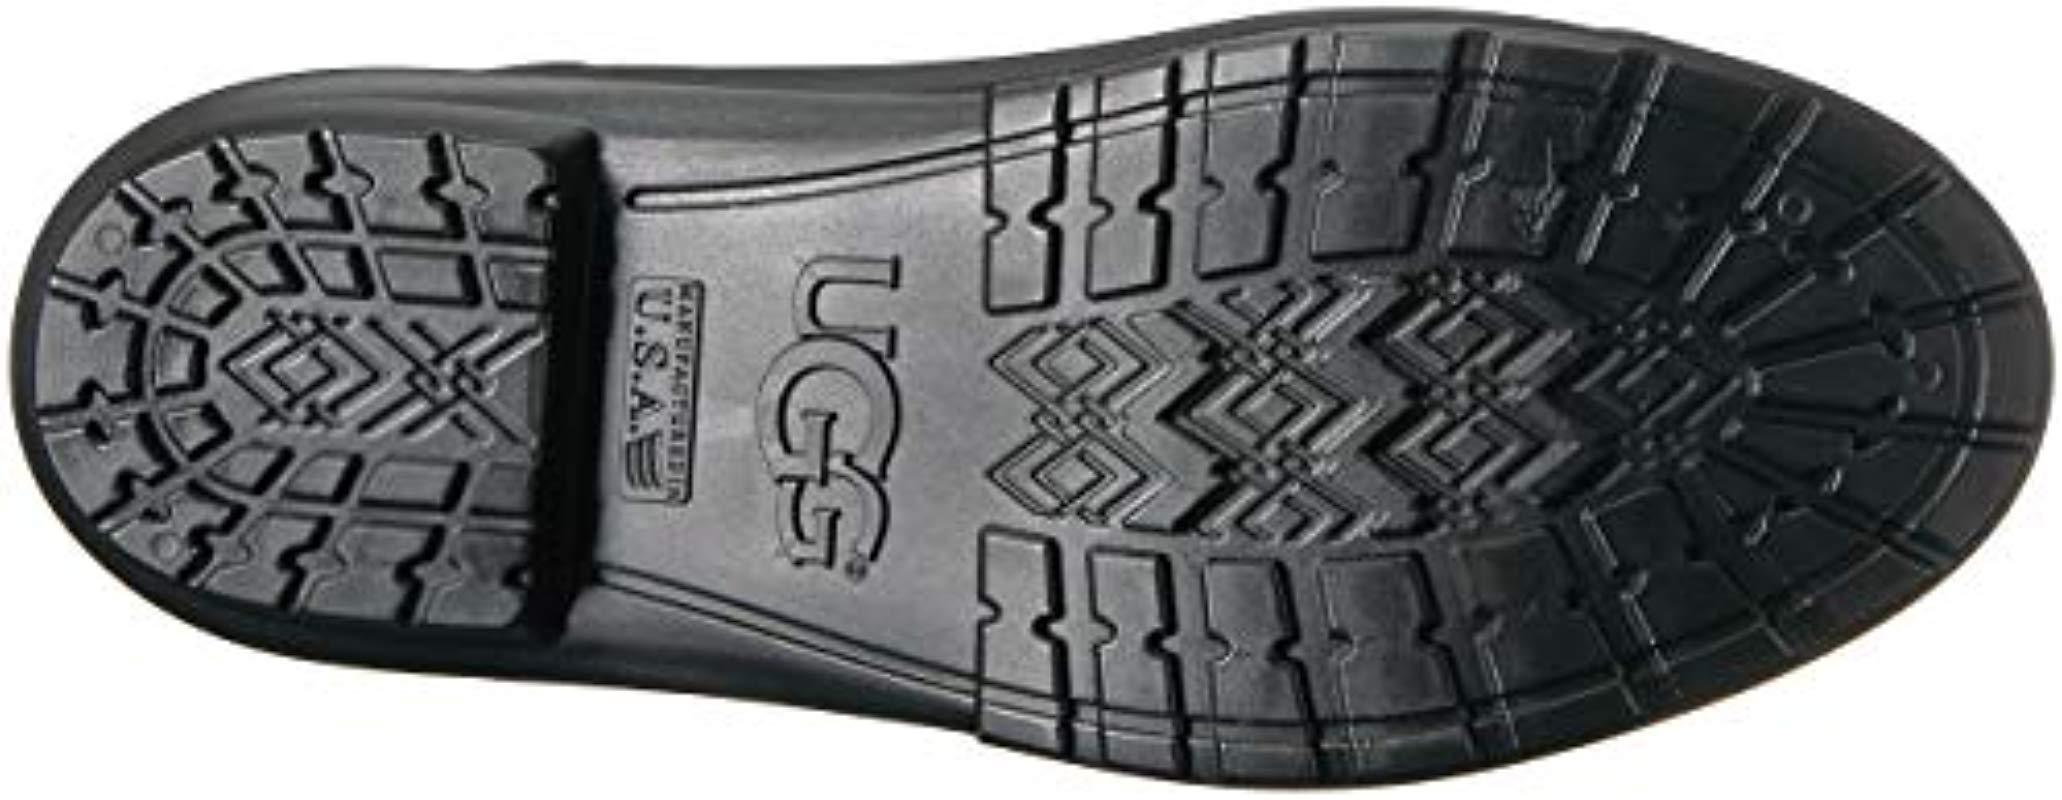 8e475986f9f Lyst - UGG Sienna Matte Rain Boot Black 12 M Us in Black